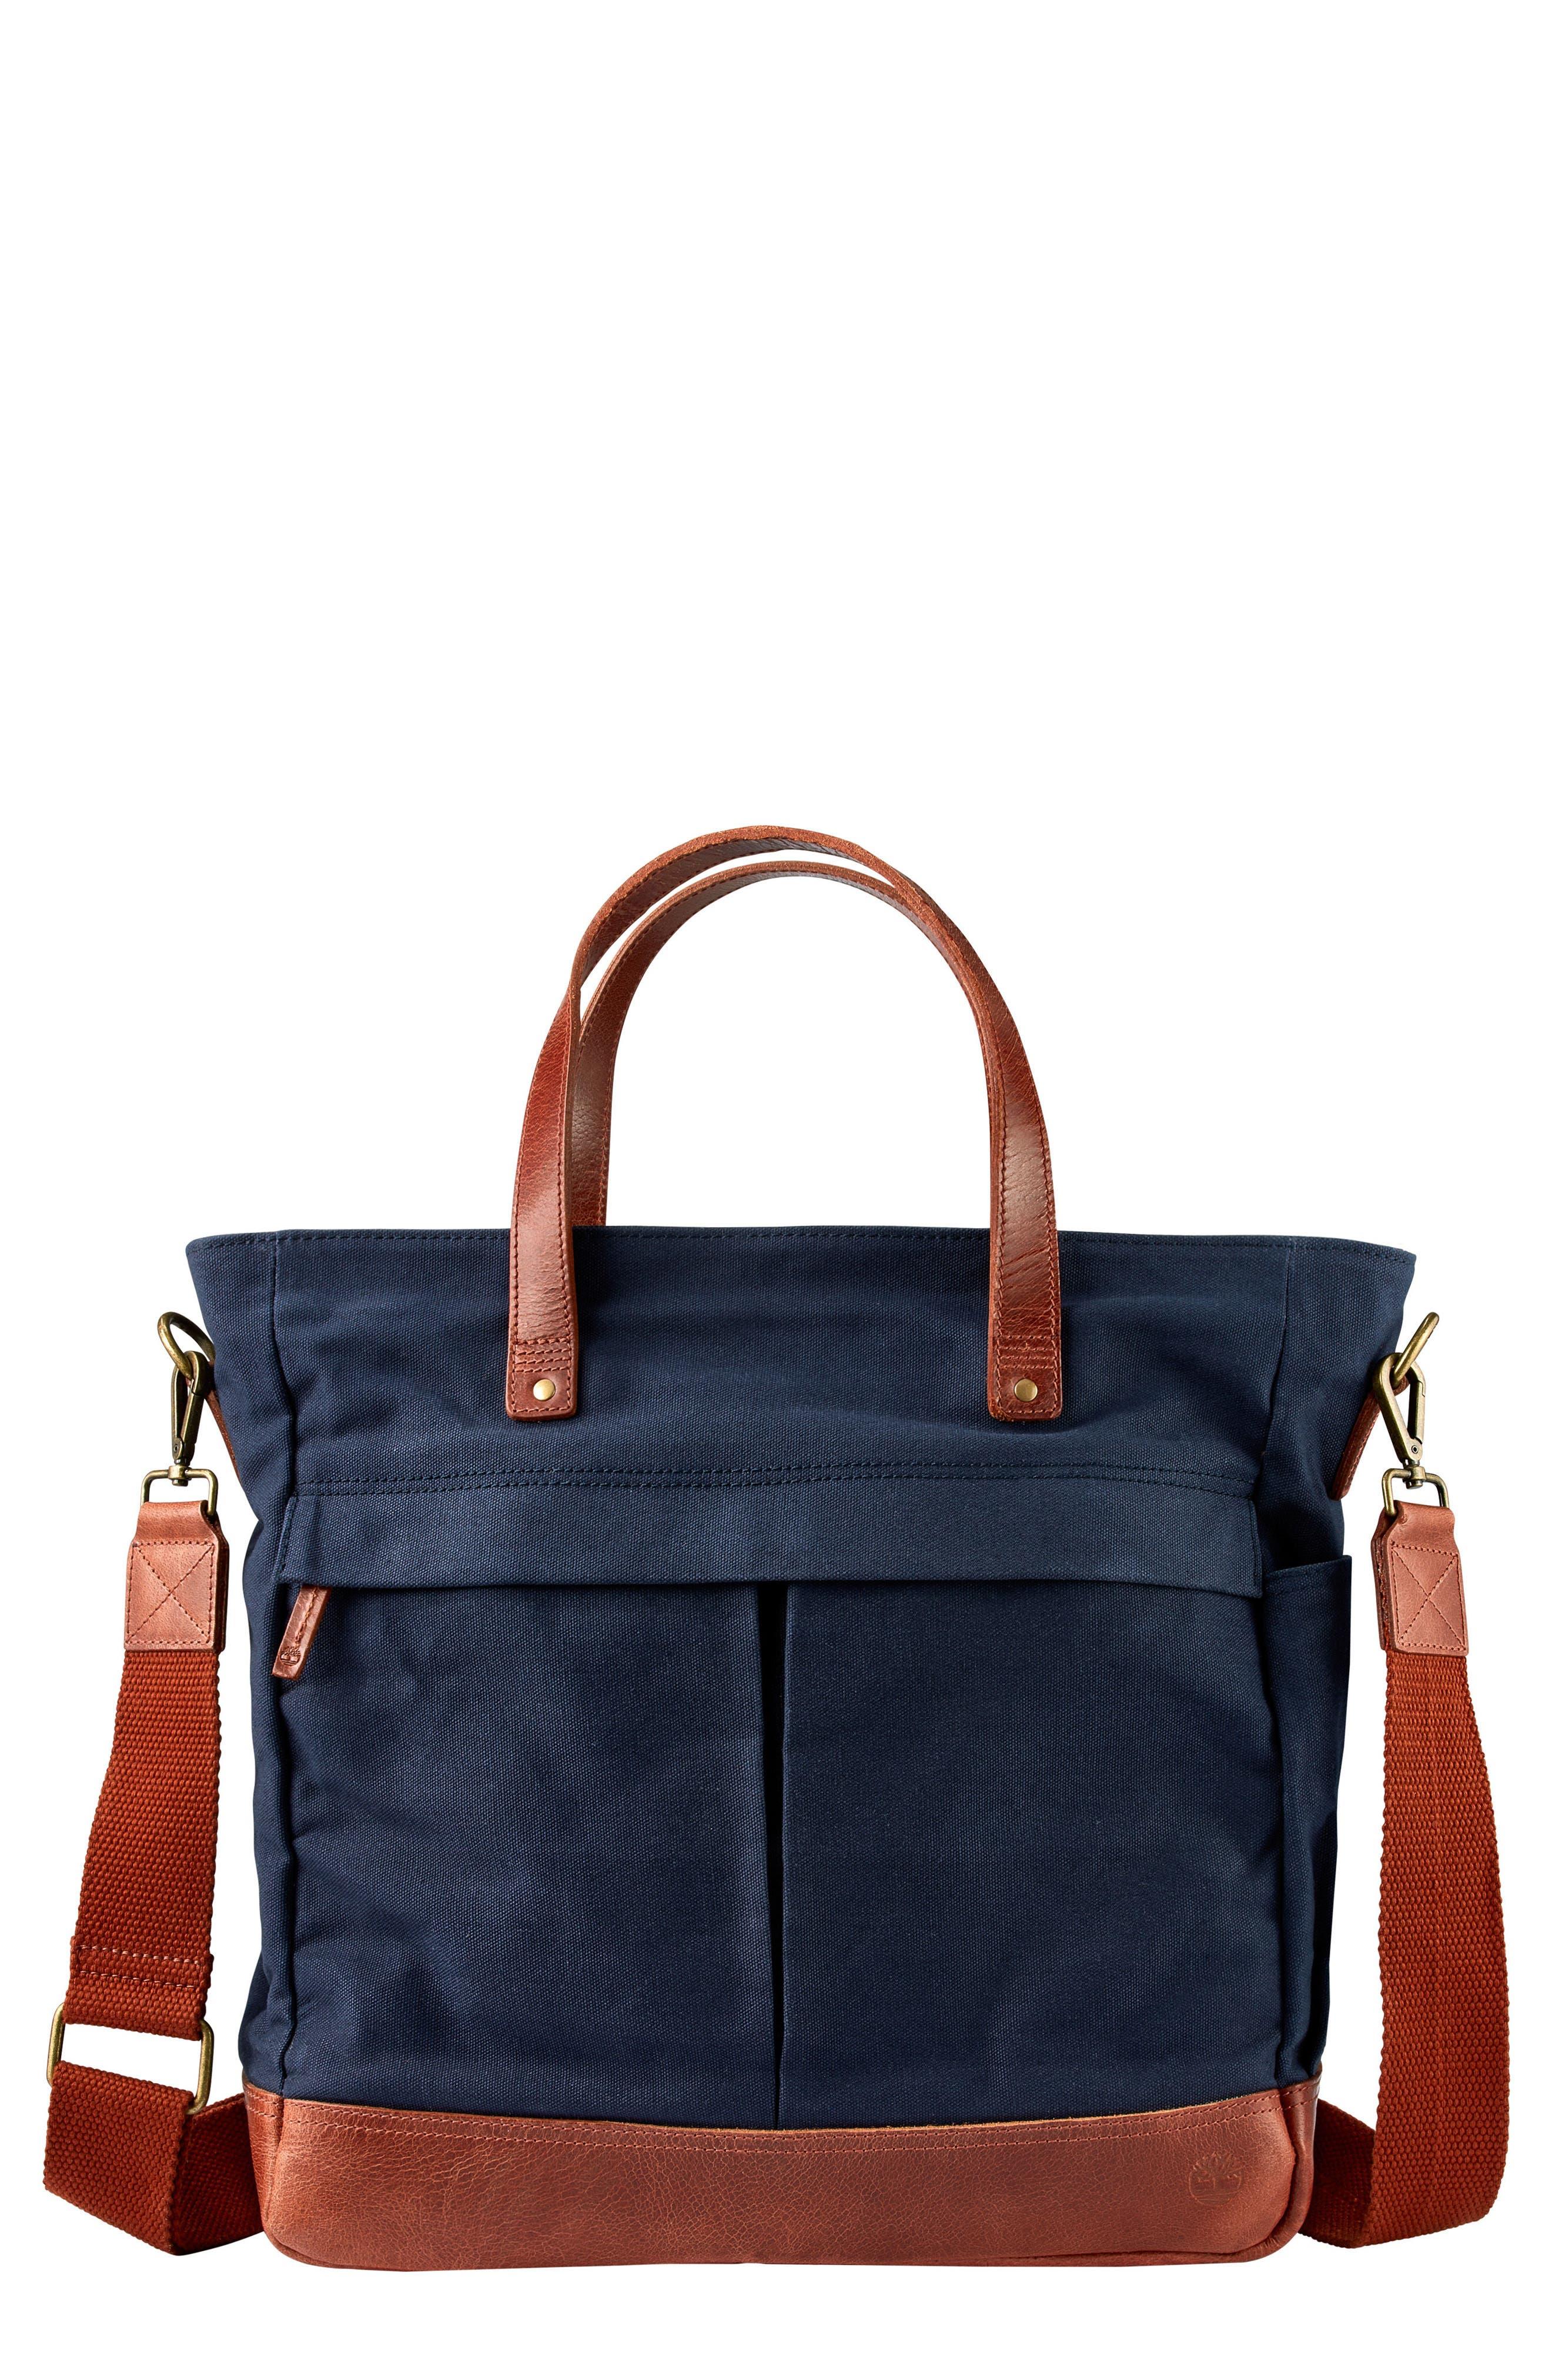 Main Image - Timberland Nantasket Tote Bag